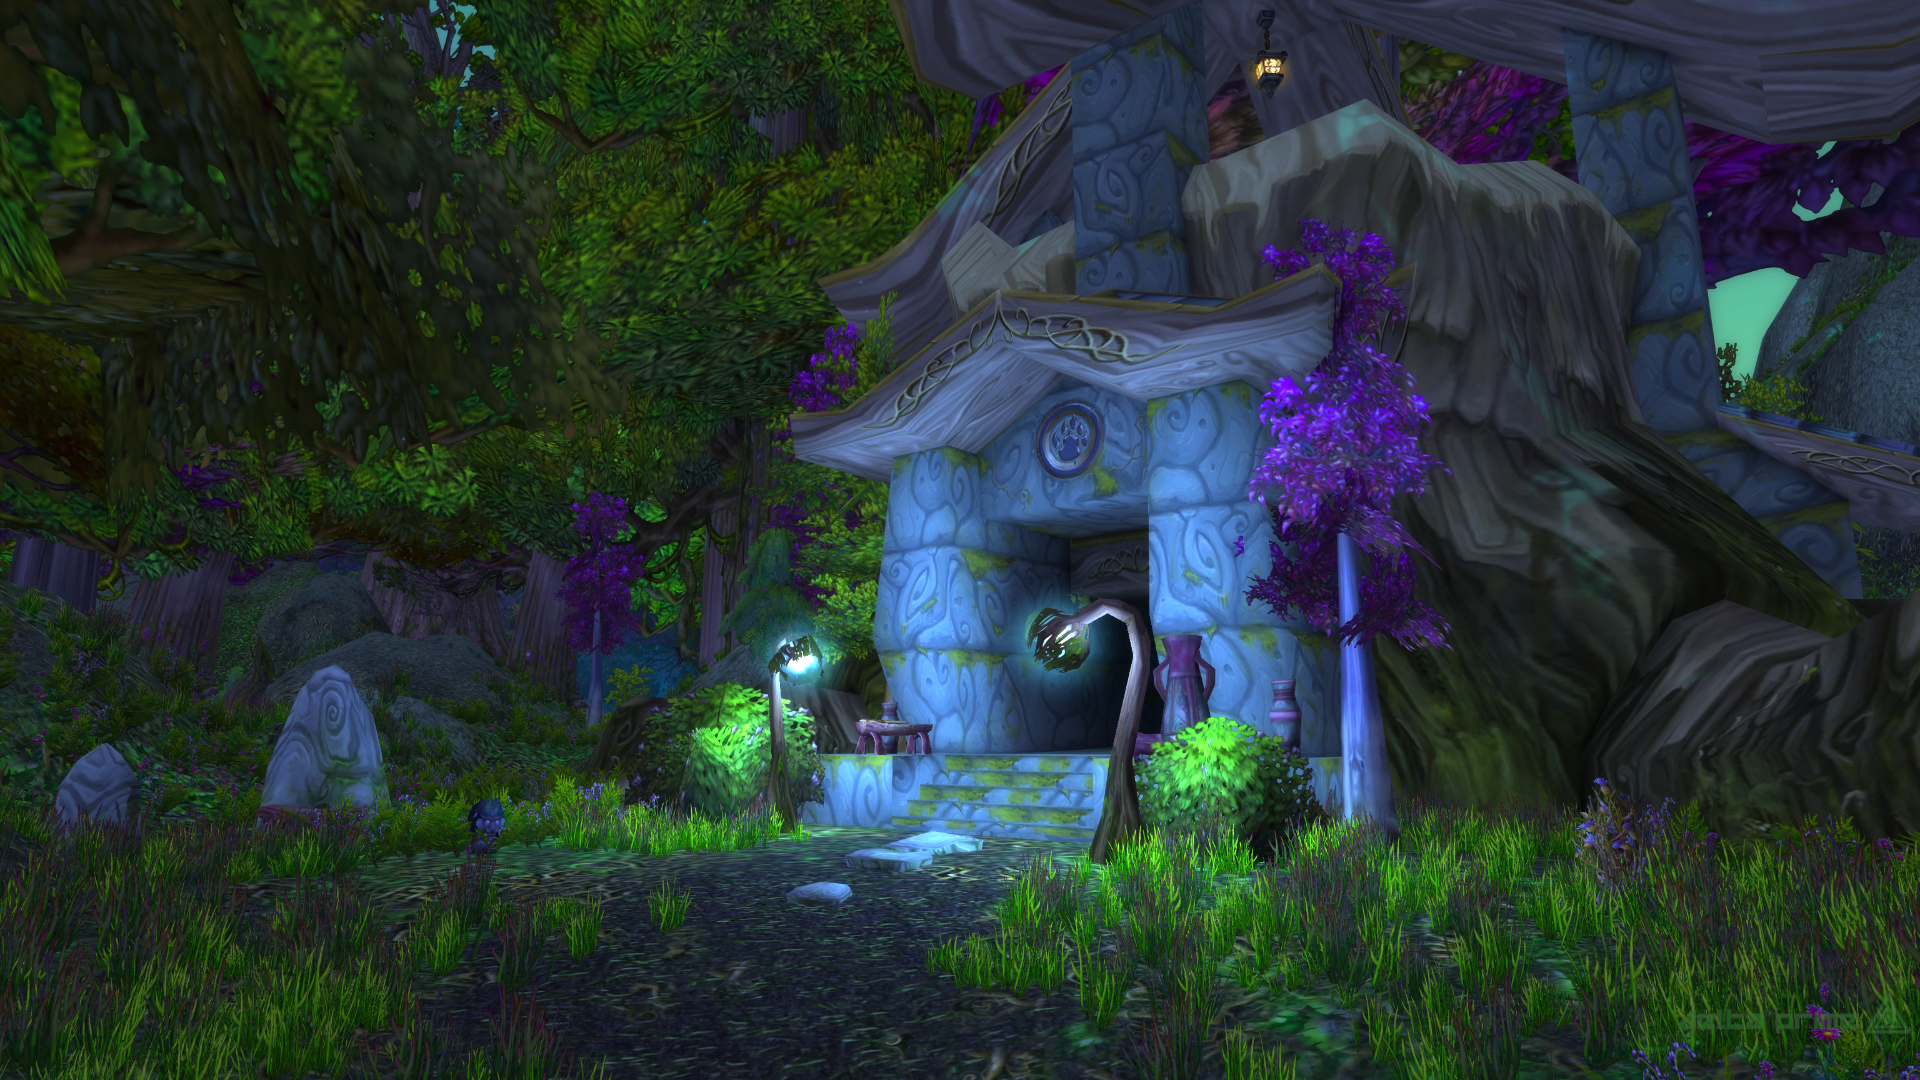 General 1920x1080 World of Warcraft Ashenvale Night Elves forest Alliance horde Druid